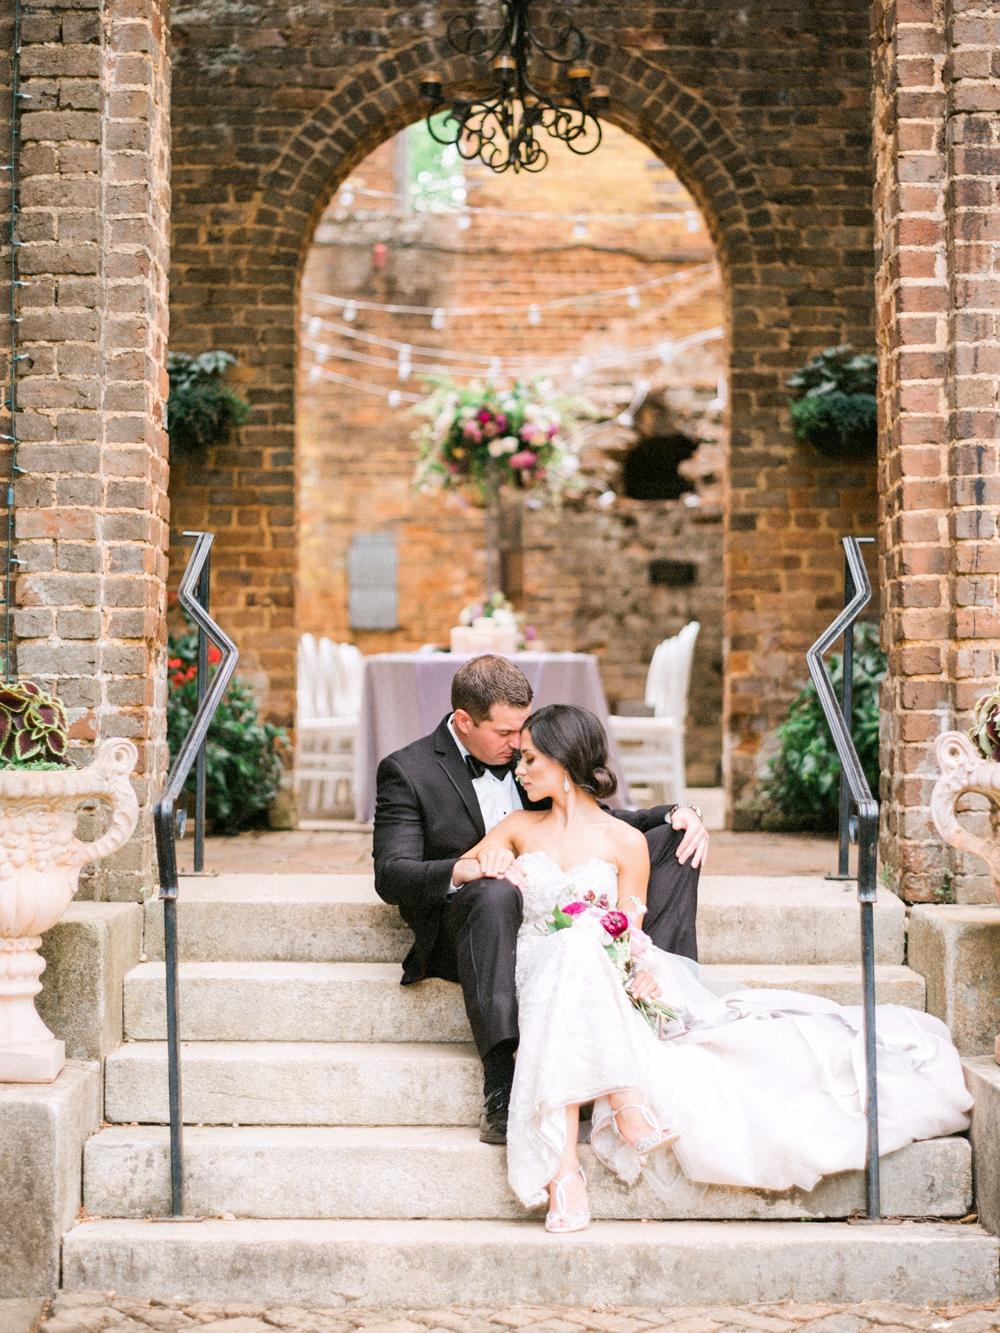 Barnsley Planation Wedding. Georgia Wedding Photographer_0037.jpg